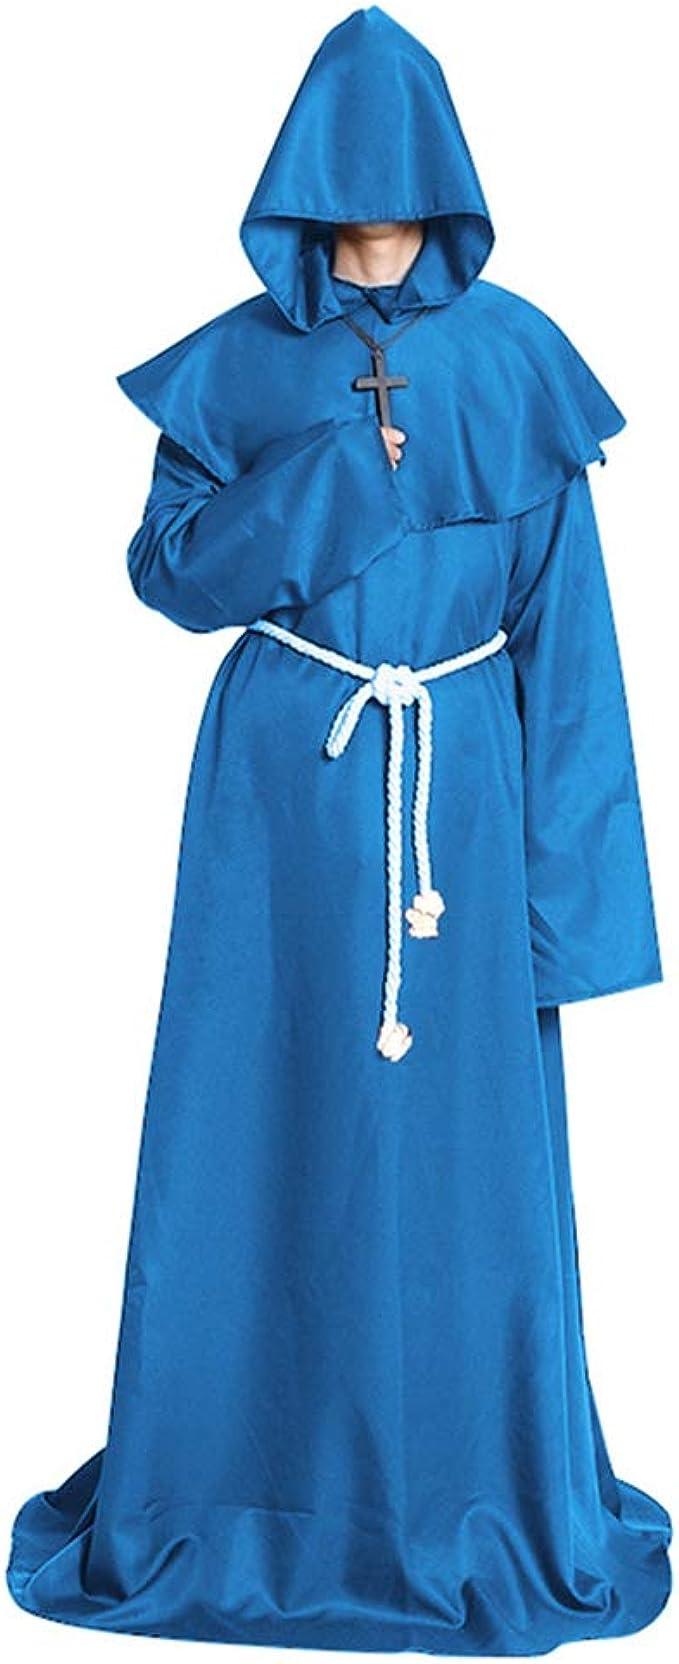 Amazon.com: Halloween disfrazes medievales sacerdotes ...